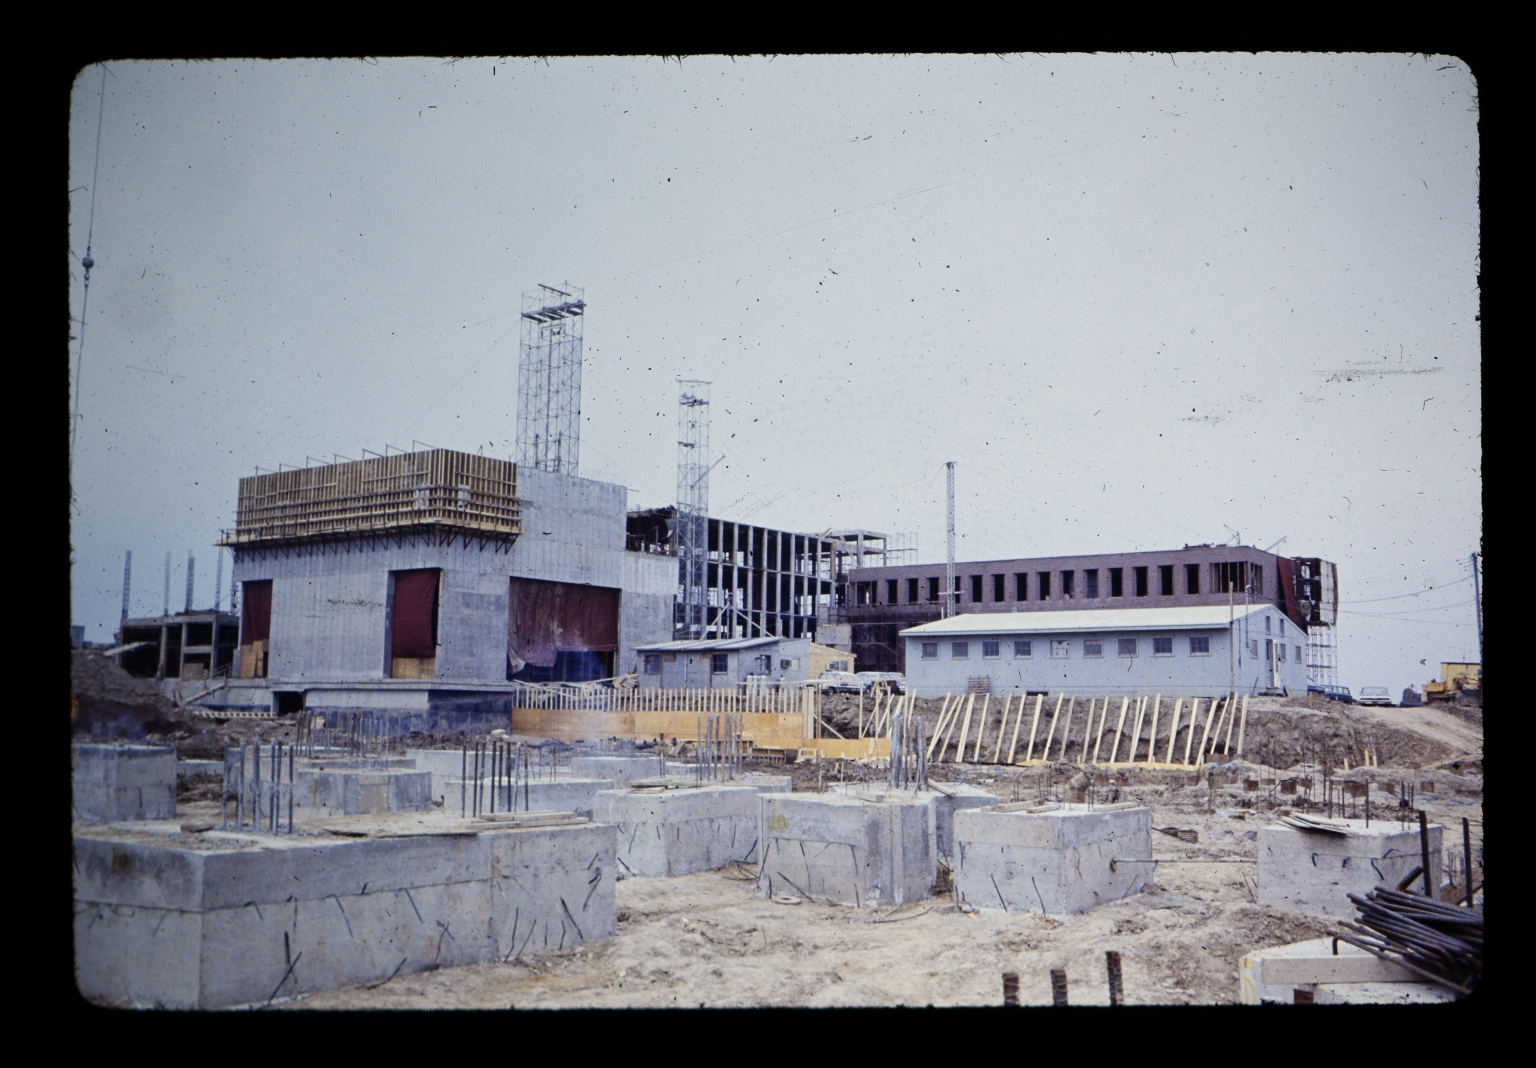 RIT new campus construction site